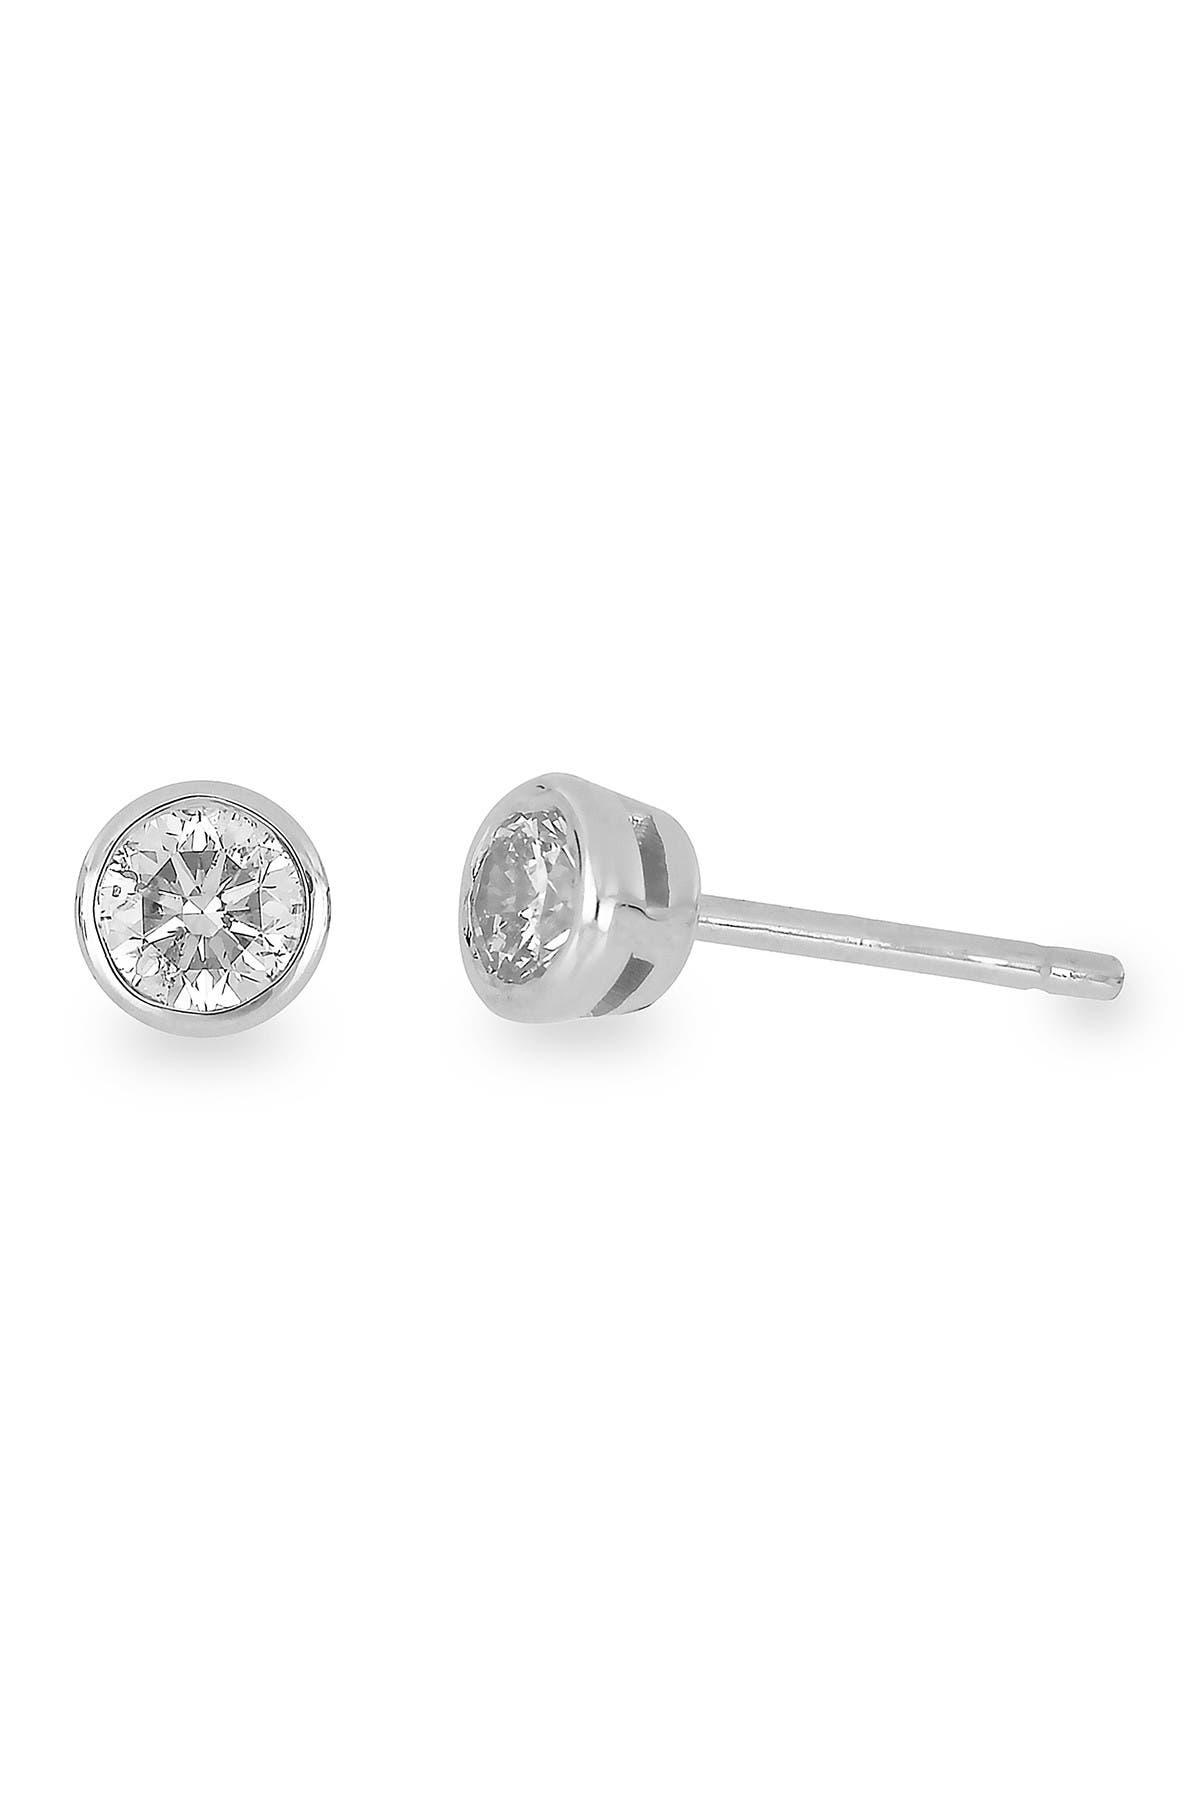 Image of Bony Levy 14K White Gold Bezel Set Diamond Stud Earrings - 0.33 ctw